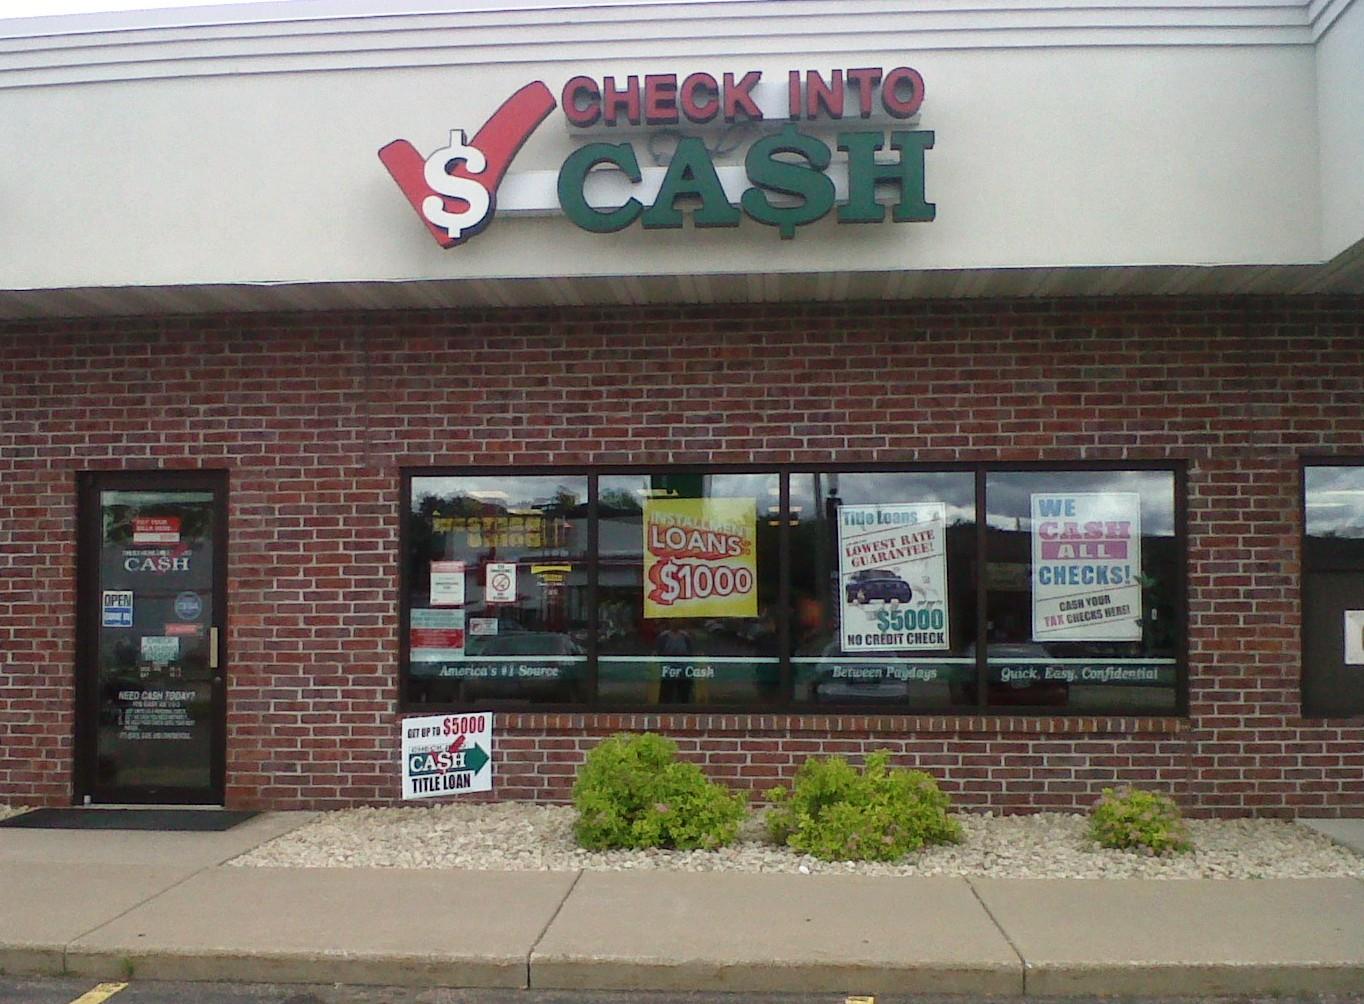 Cash advance in inkster mi image 5